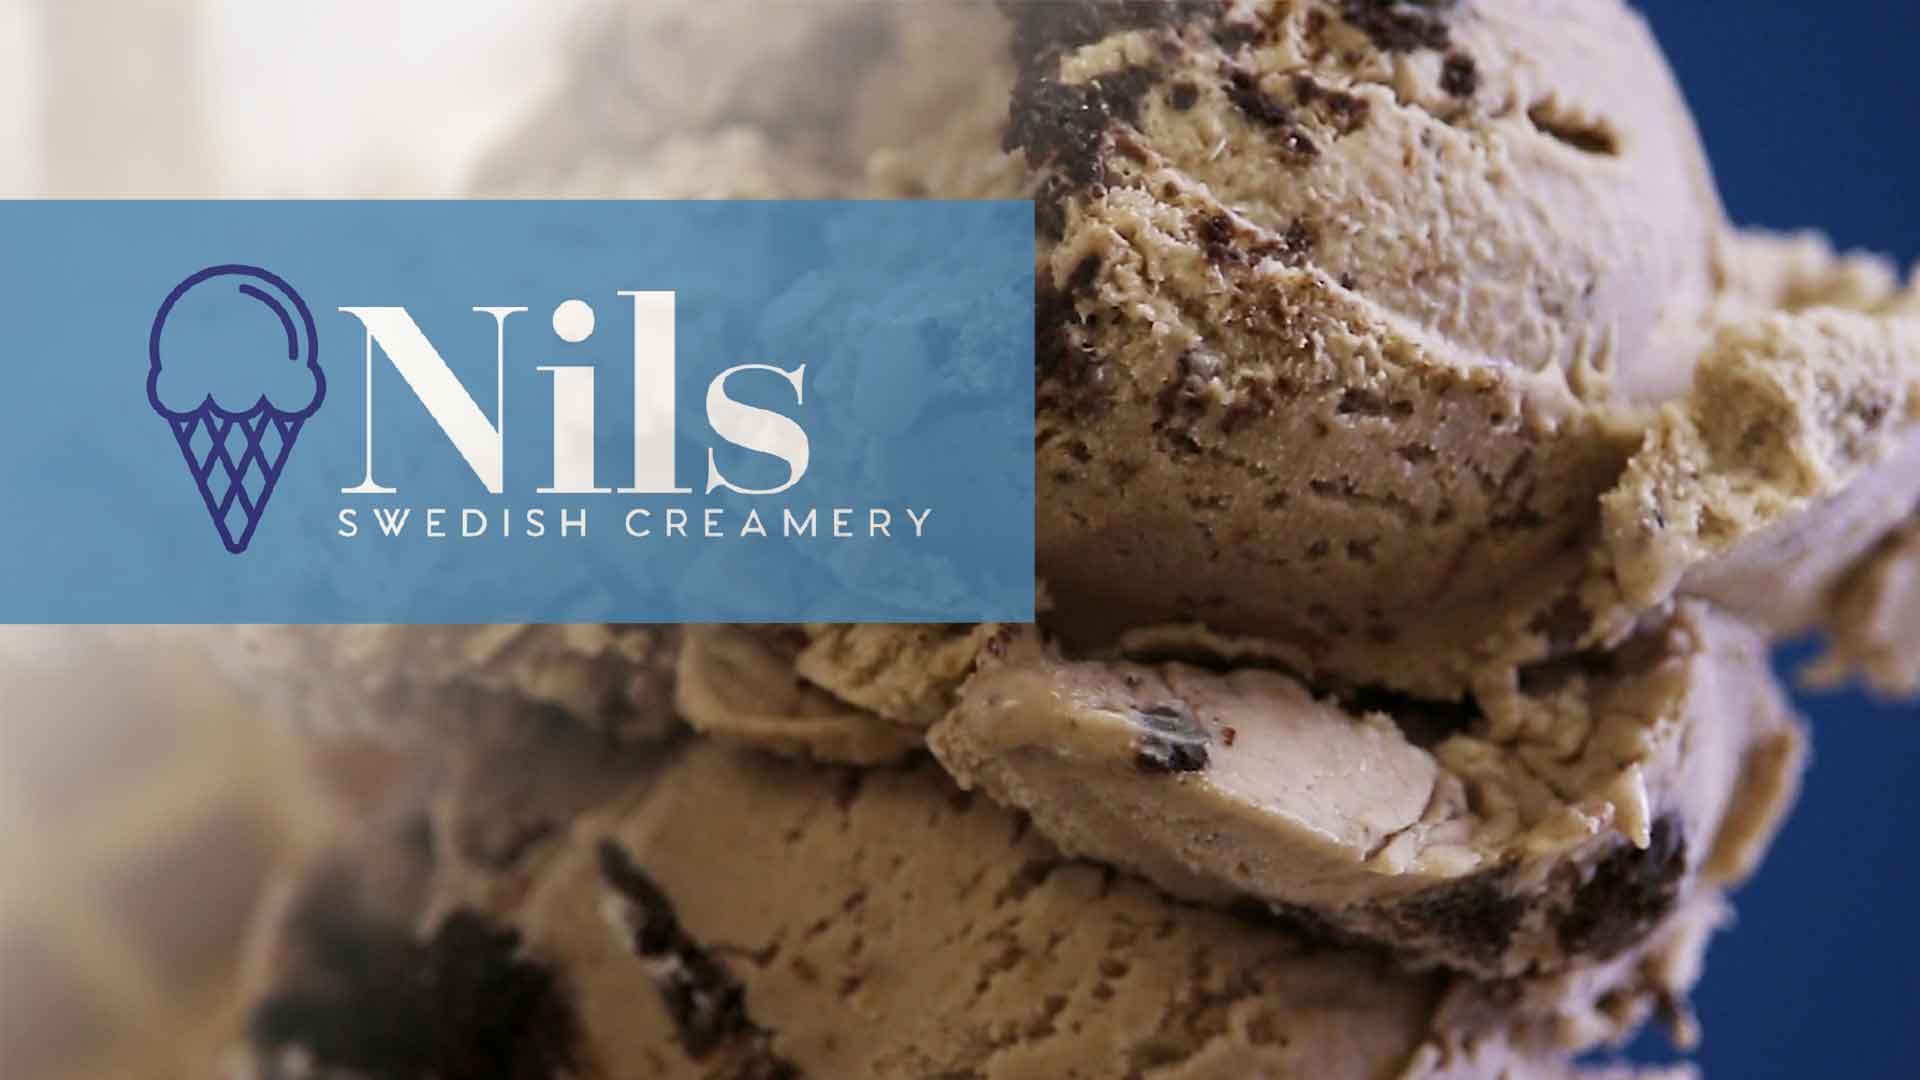 Nils Swedish Creamery